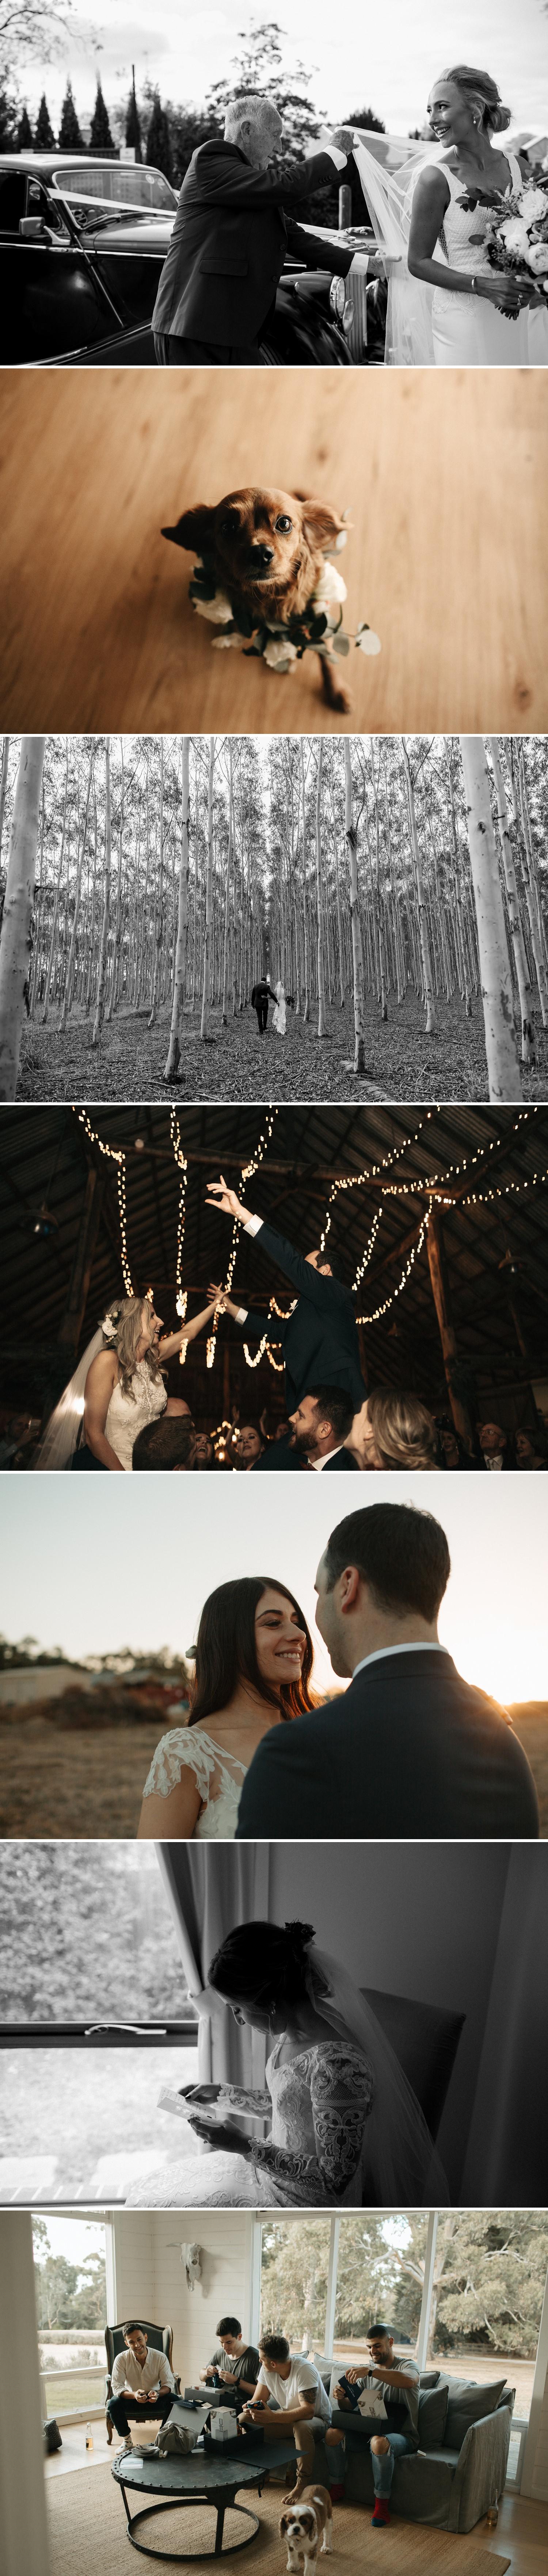 relaxed-wedding-photographer-melbourne_0020.jpg